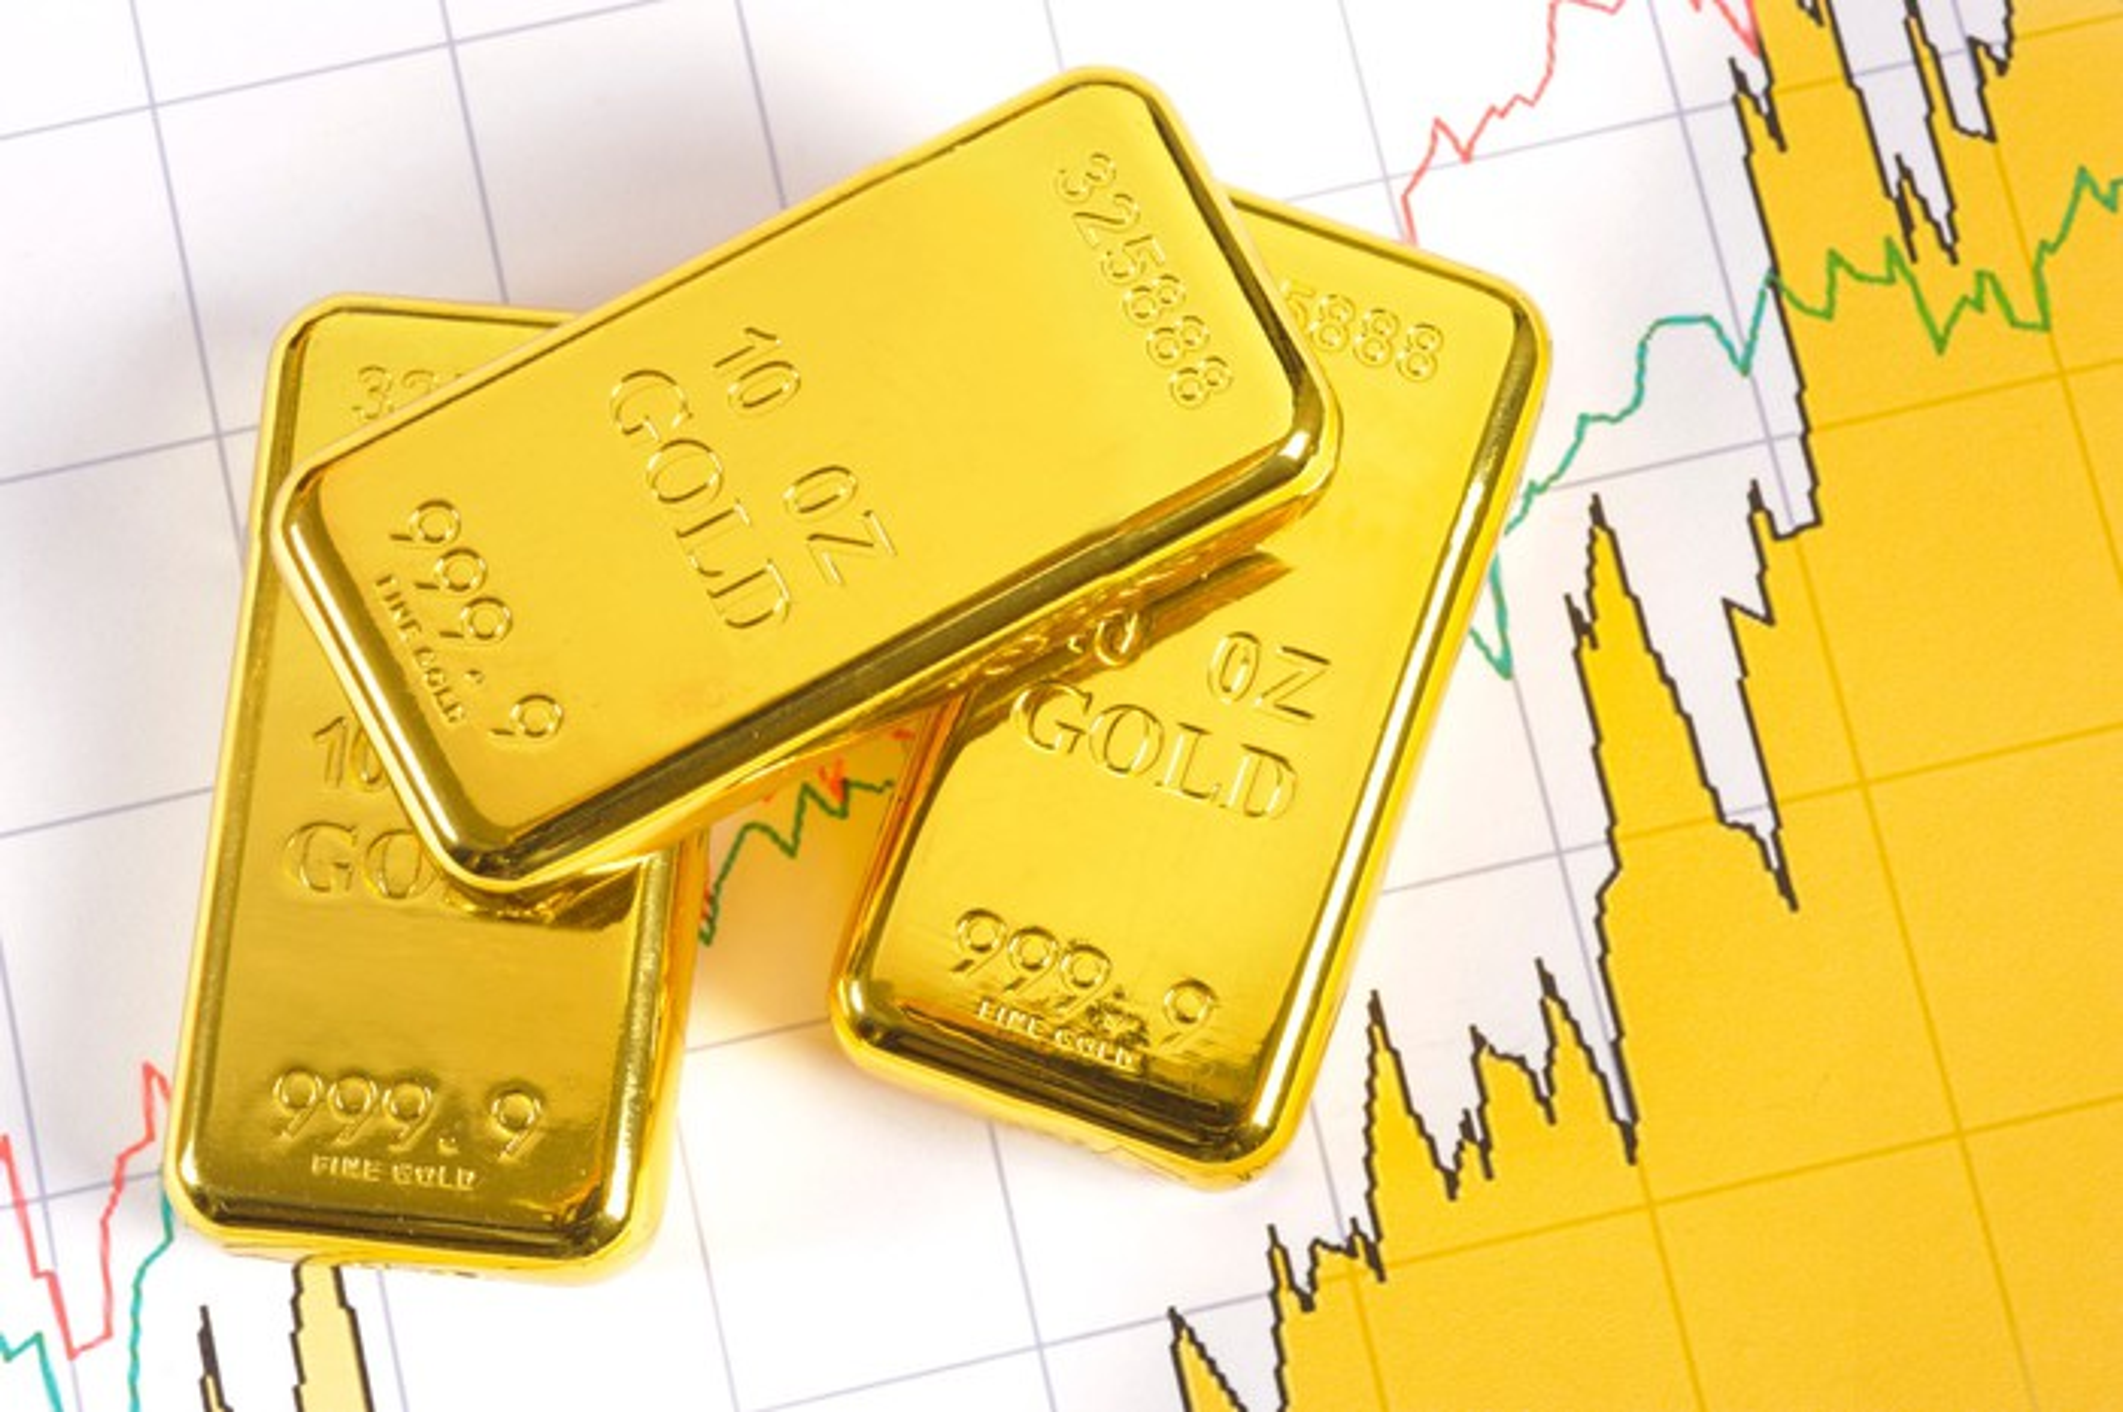 Rising stock chart next to gold ingots.